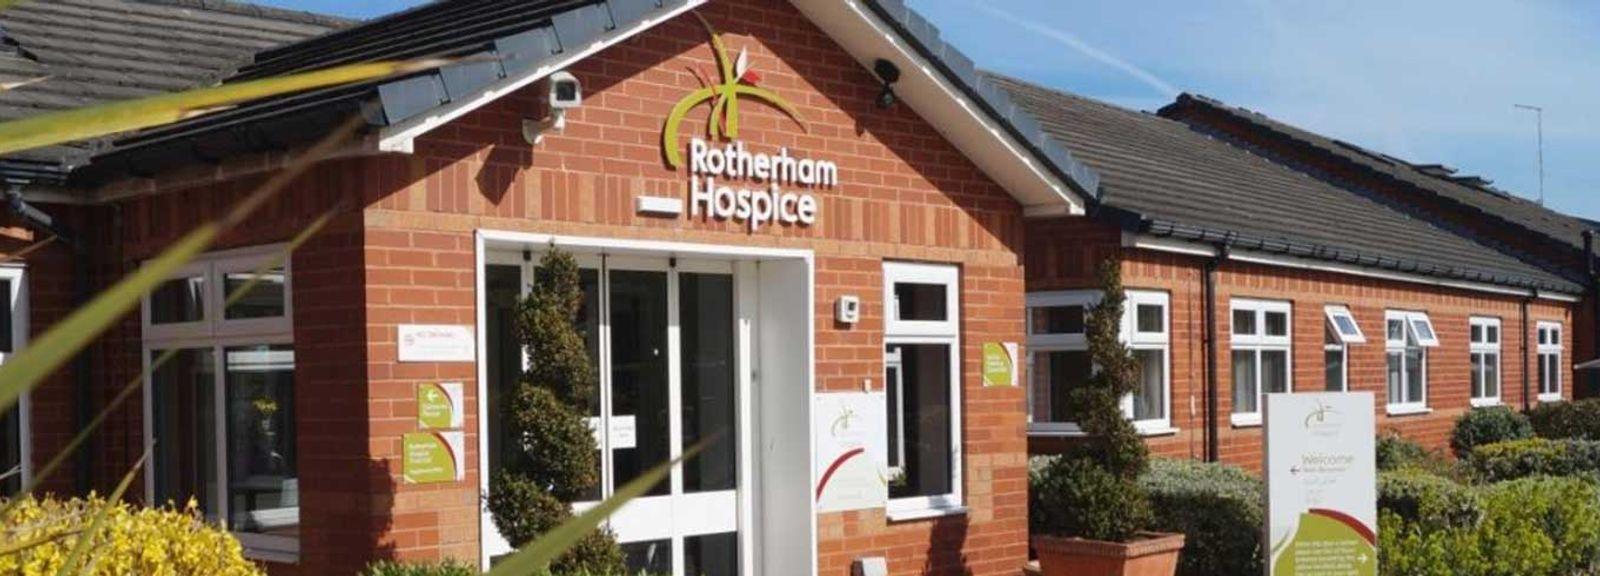 Rotherham Hospice